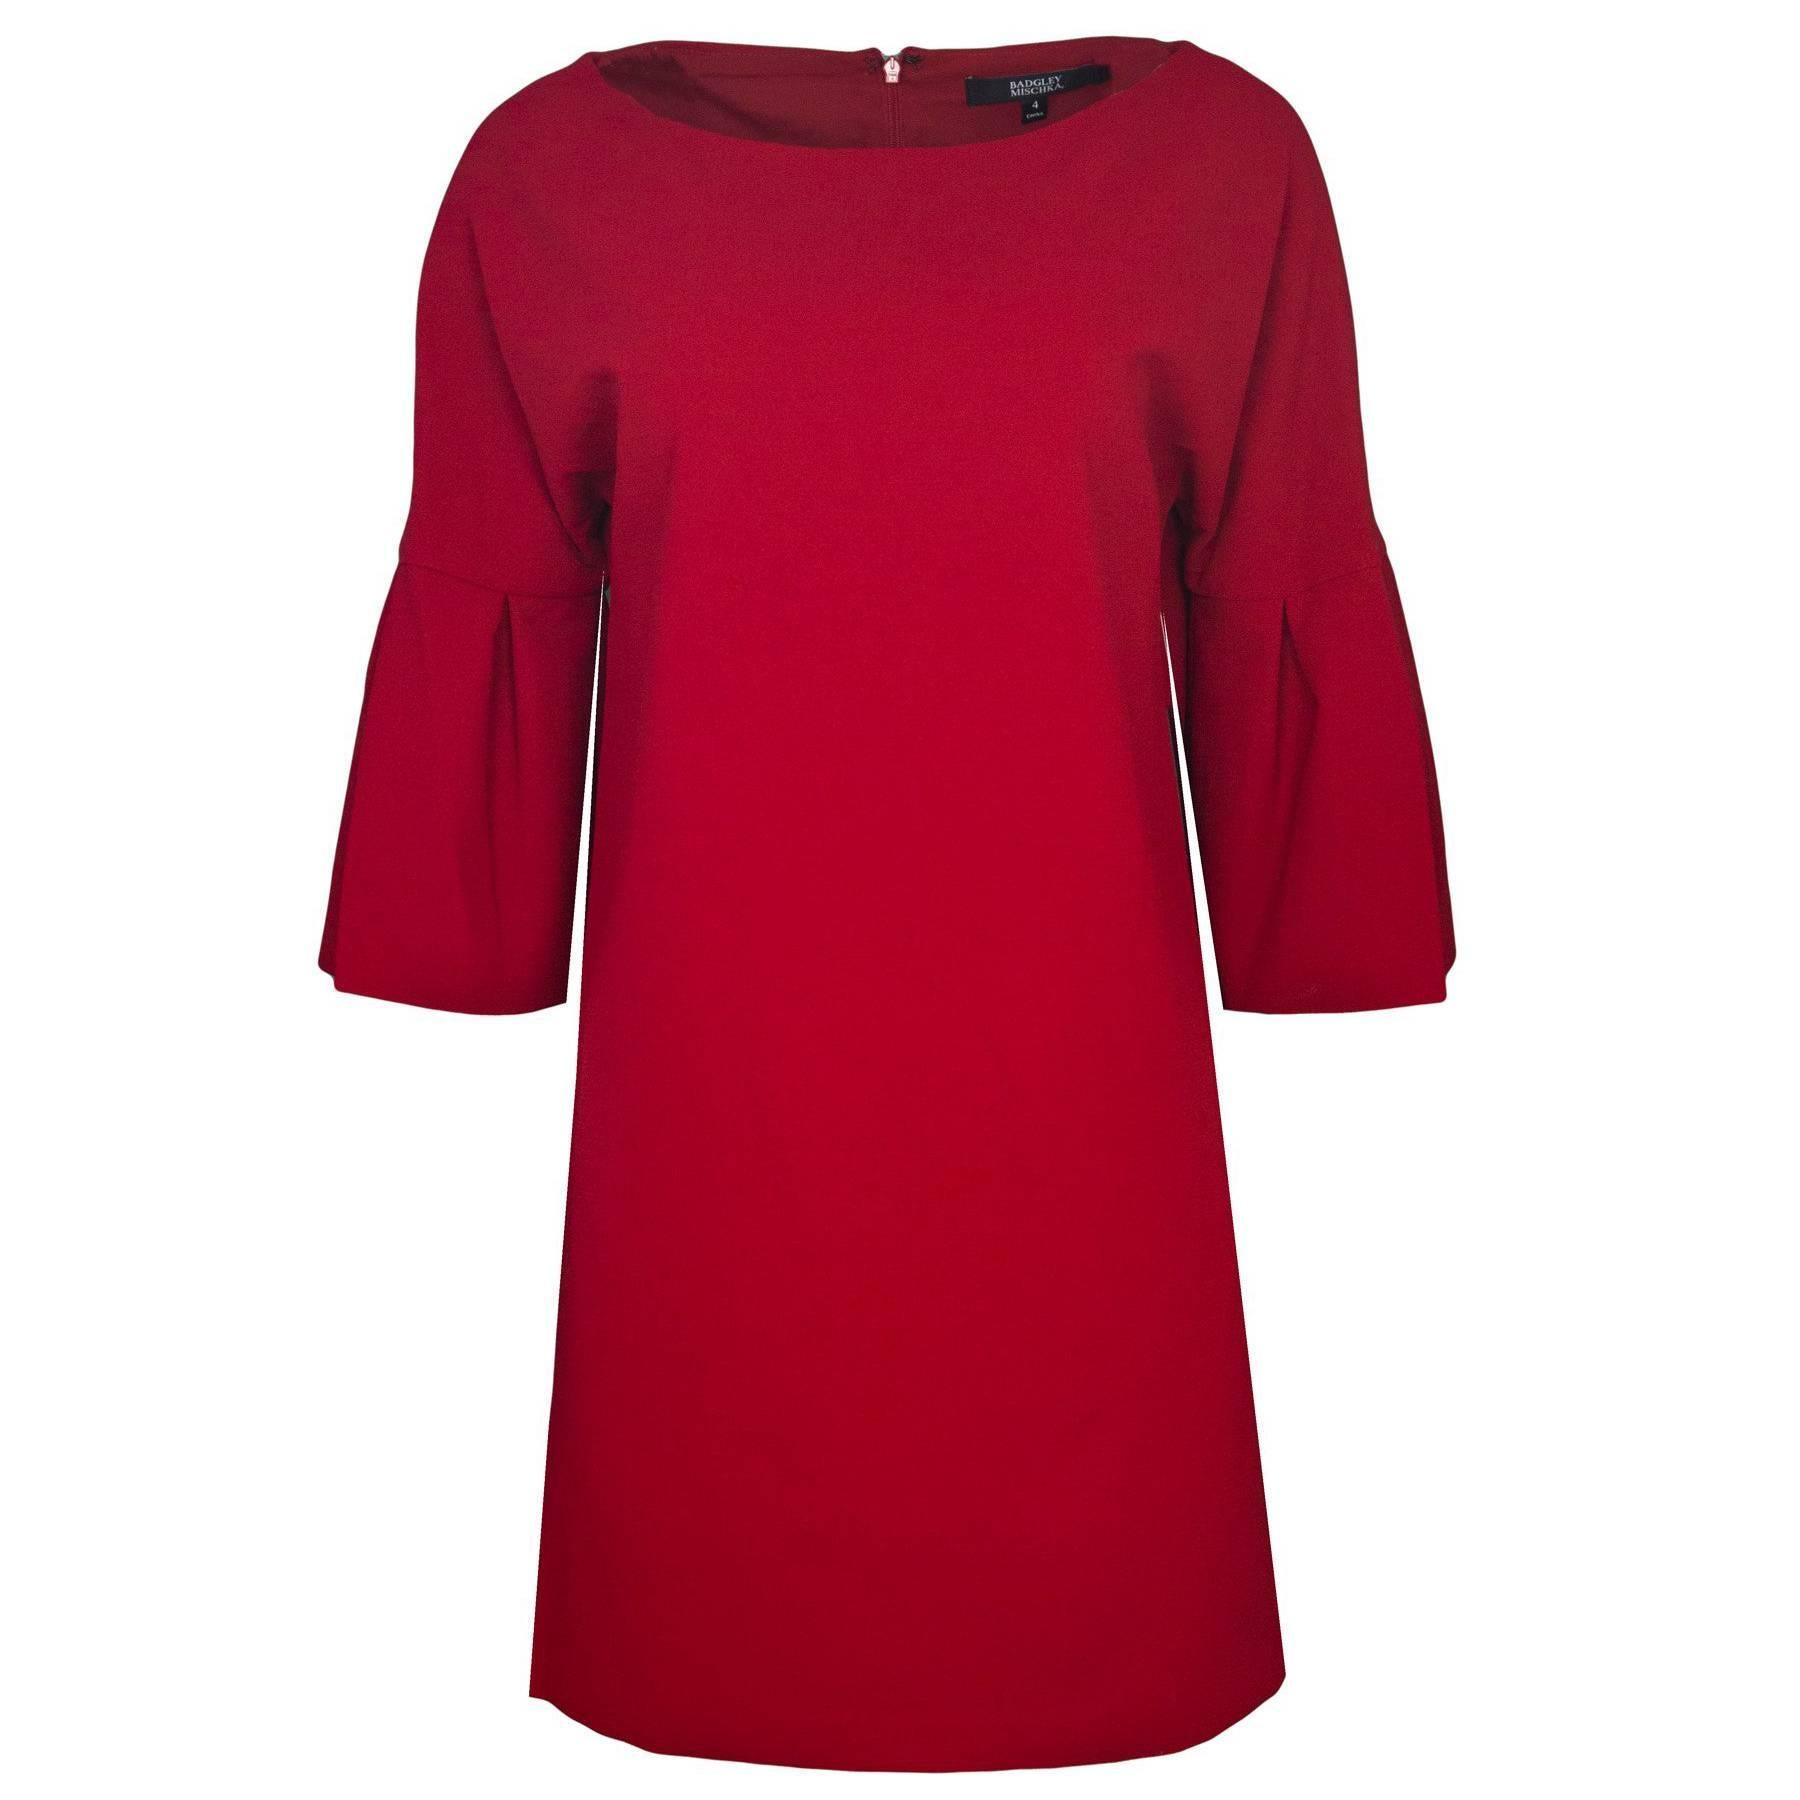 Badgley Mischka Red Dress